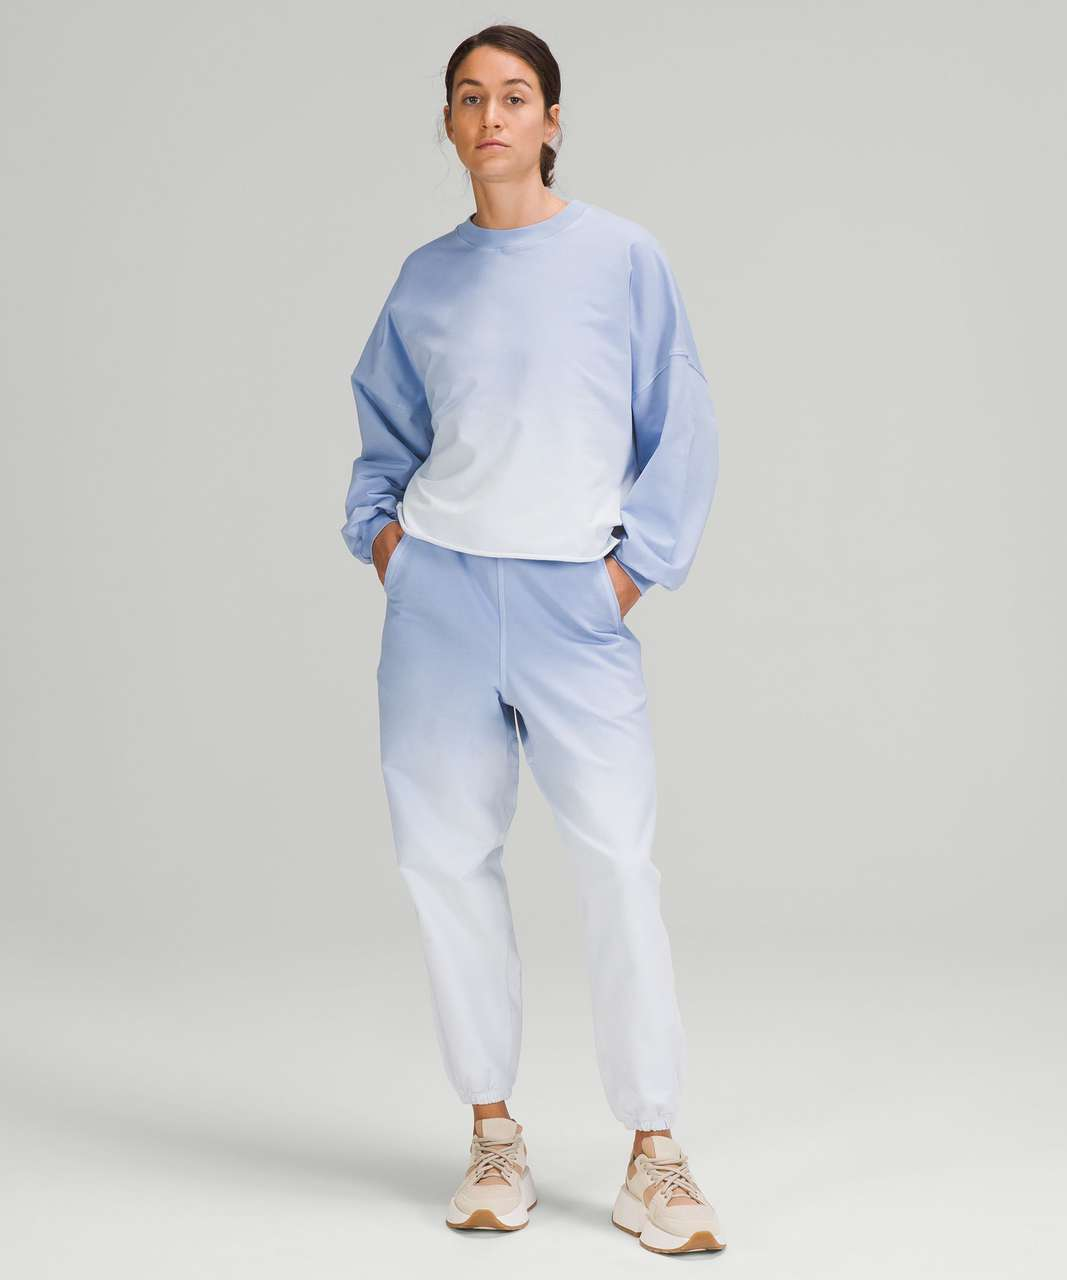 Lululemon LA Oversized Boxy Crew - Blue Linen Ombre Wash